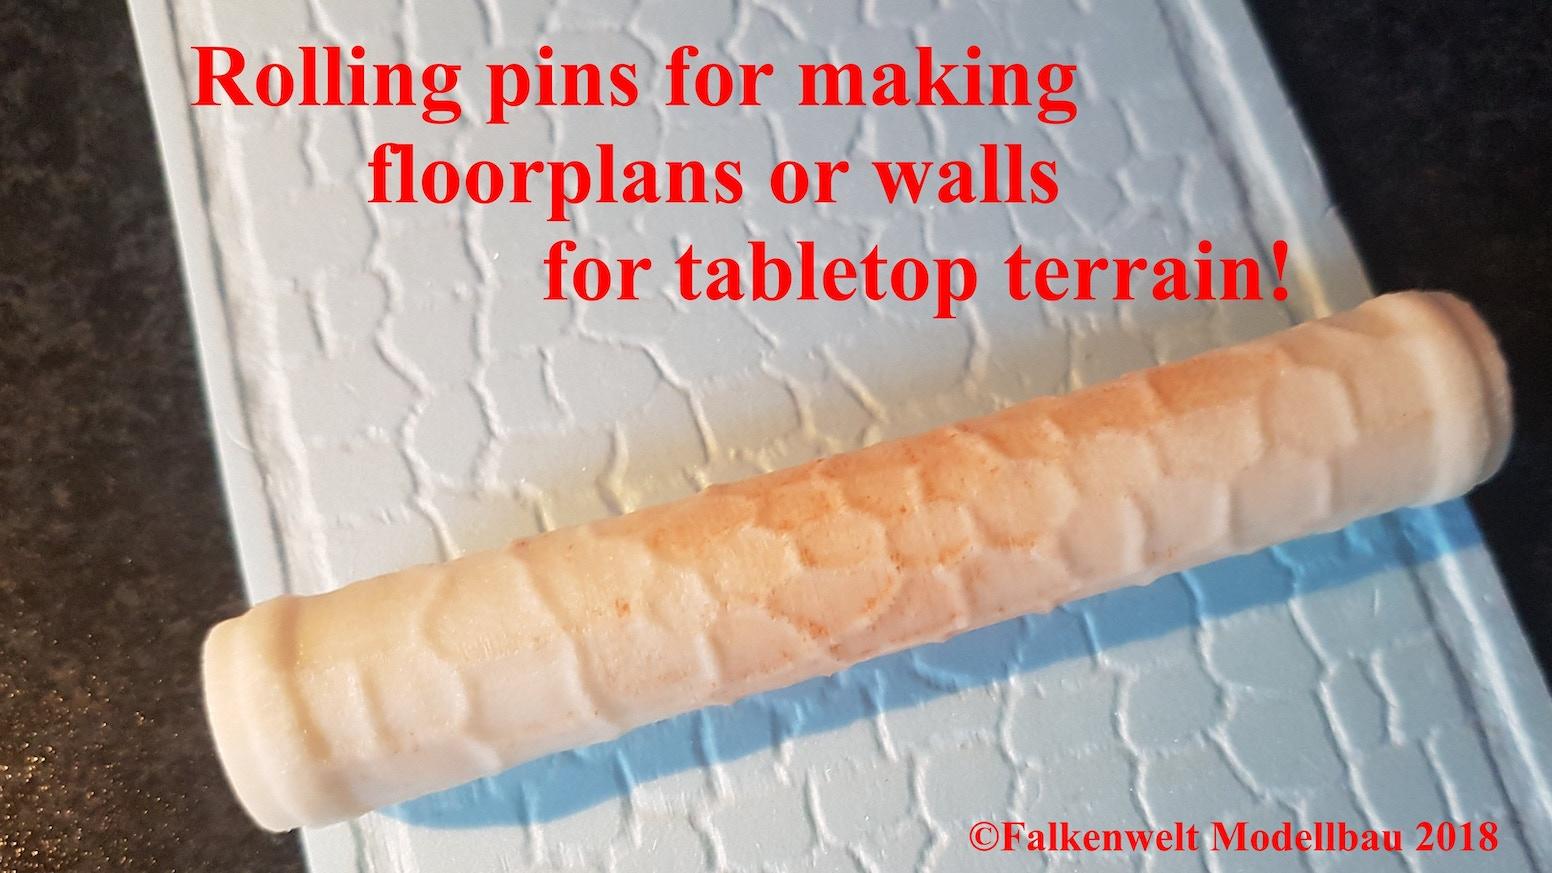 Rolling Pins For Making Floor Plans Walls By Falkenwelt Modellbau